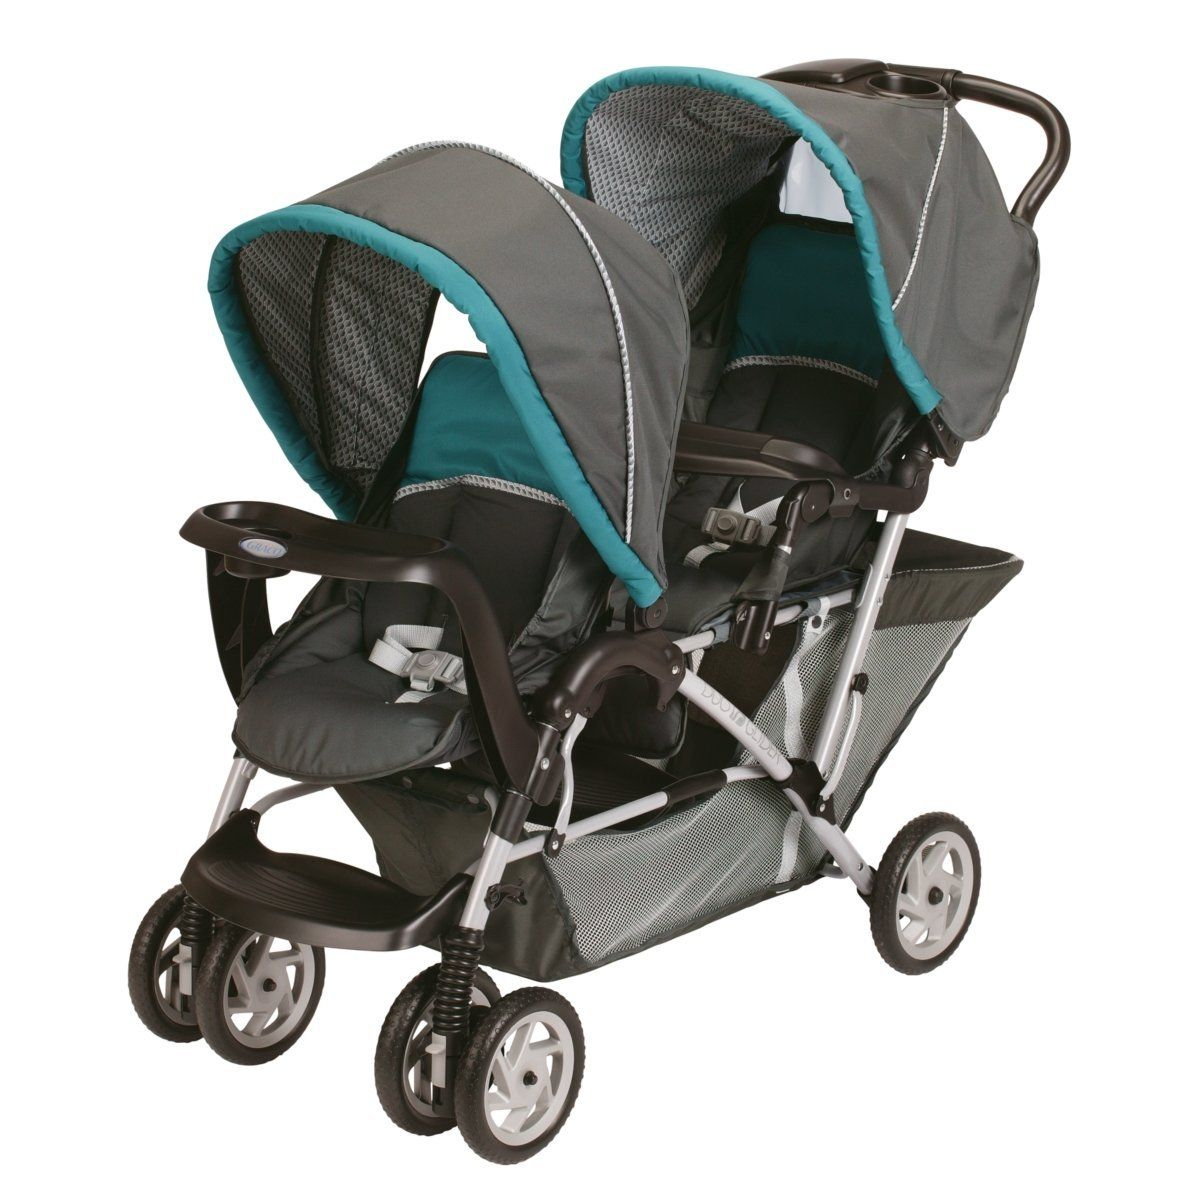 Graco Snugride Click Connect 40 Car Seat Compatible